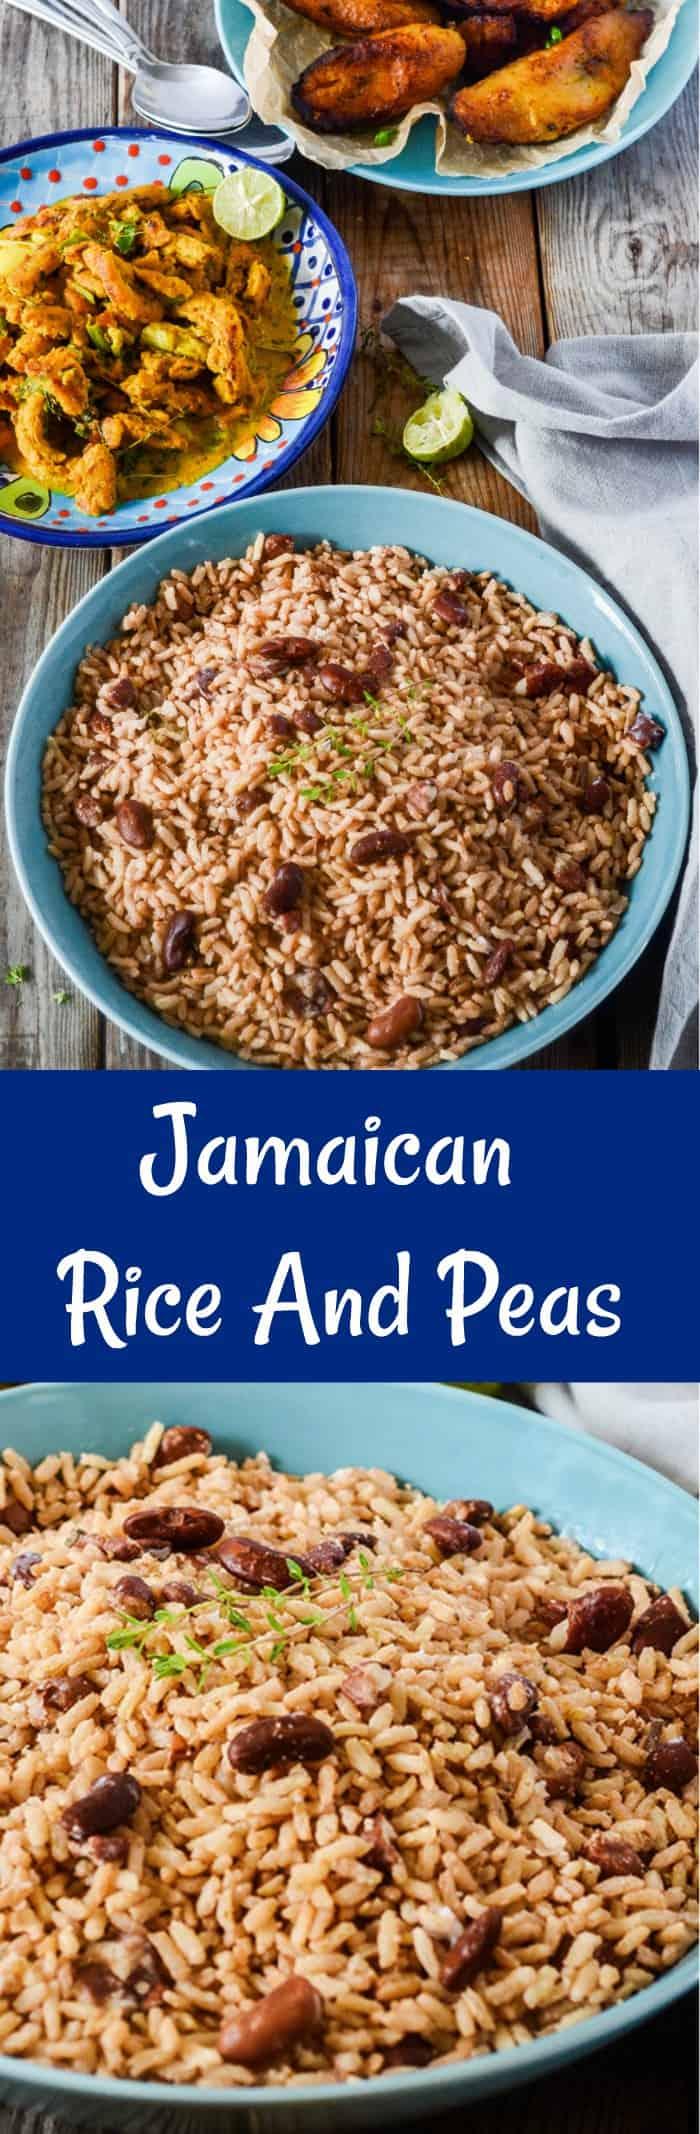 jamaican rice and peas recipe  healthier steps